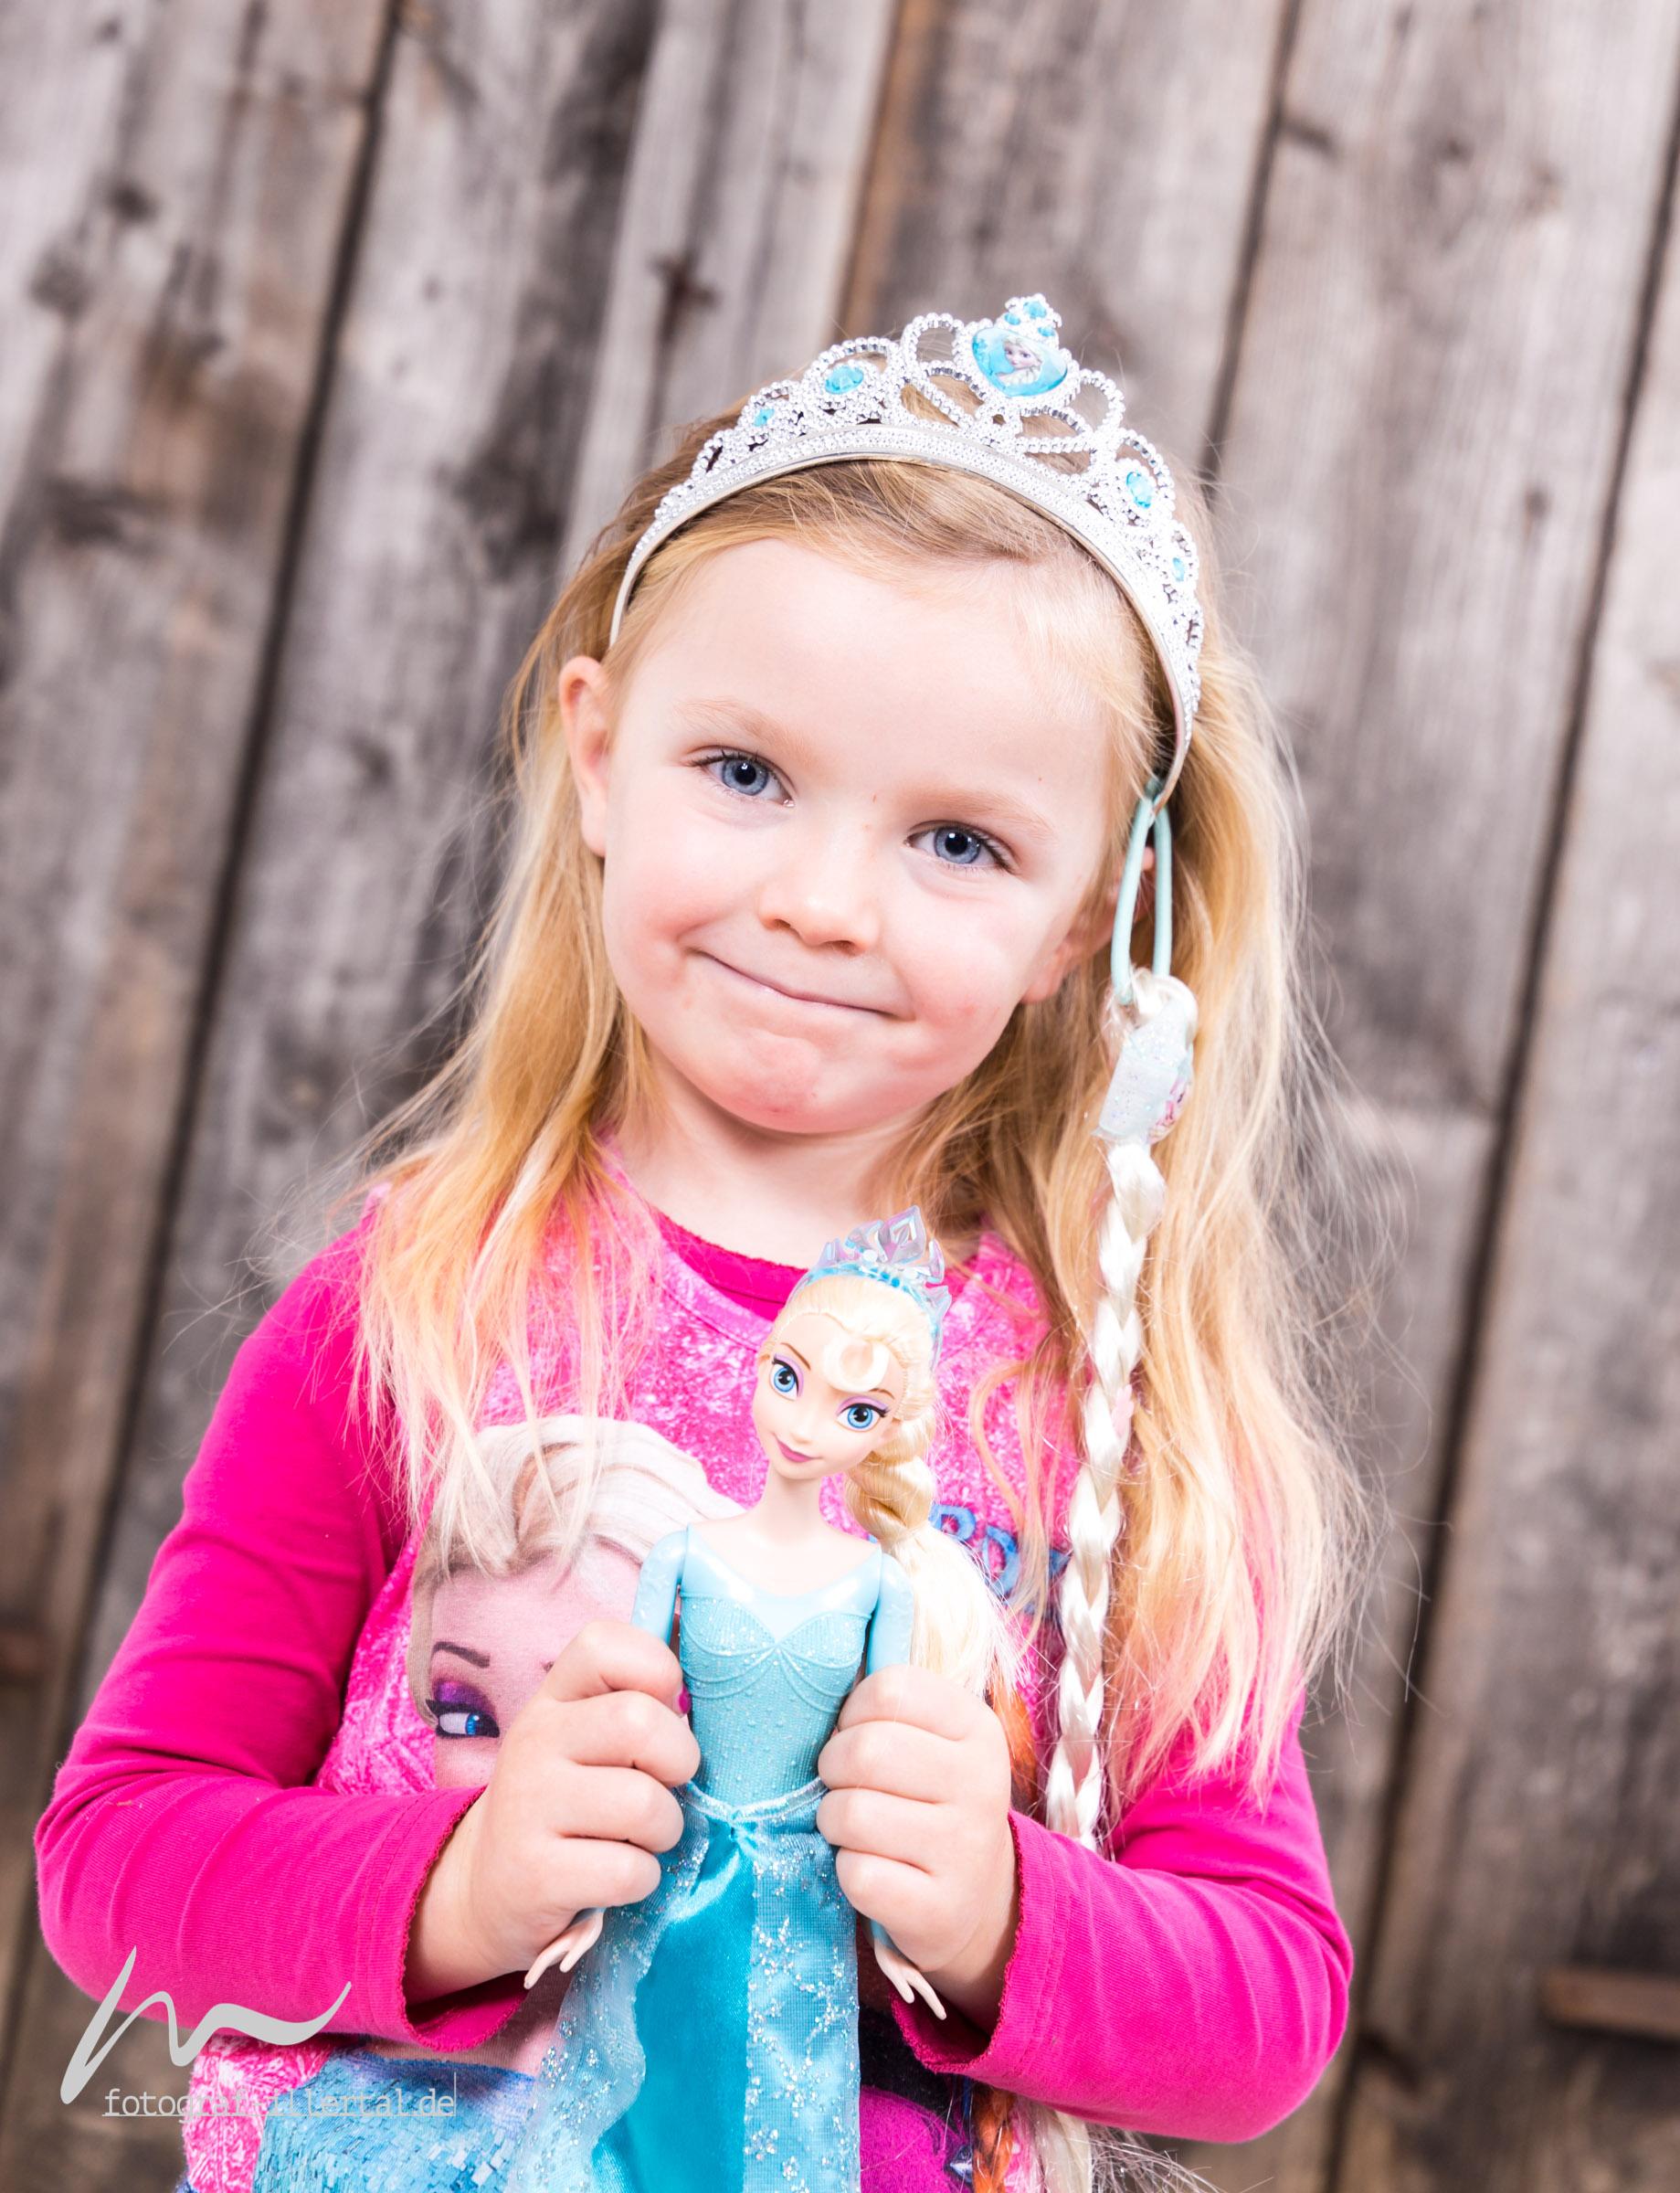 Fotograf Illertal-Christian Miller-Kinderfotos-Familienfotos-_MG_6393